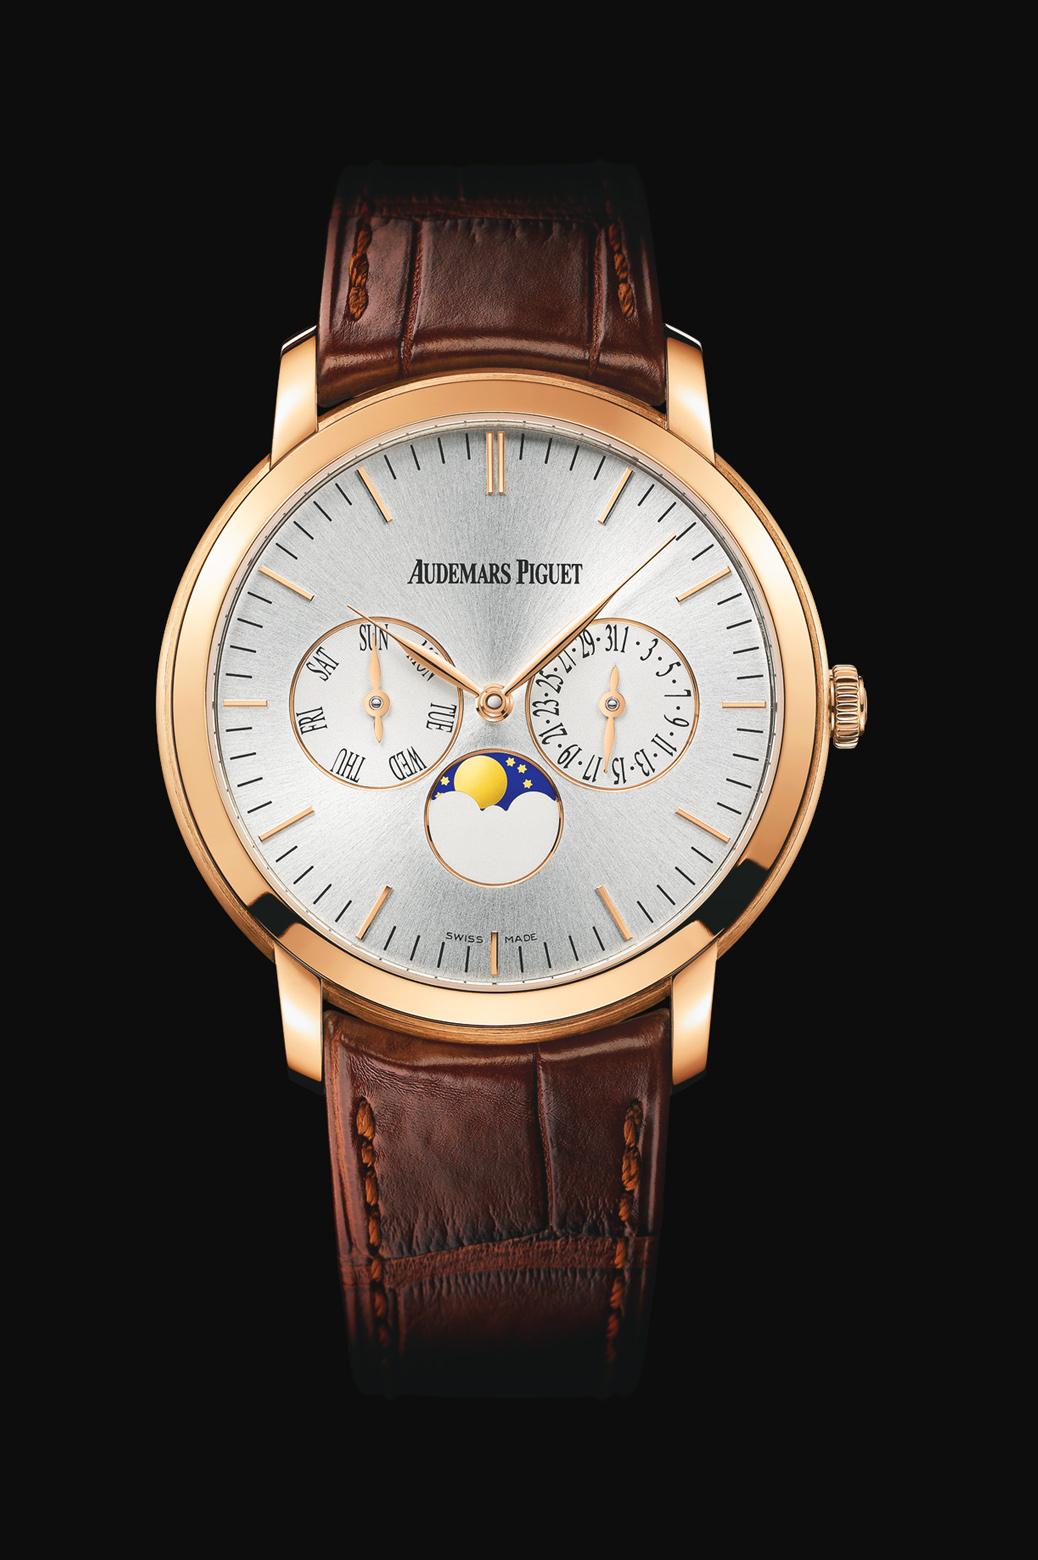 часы Audemars Piguet MOON-PHASE CALENDAR